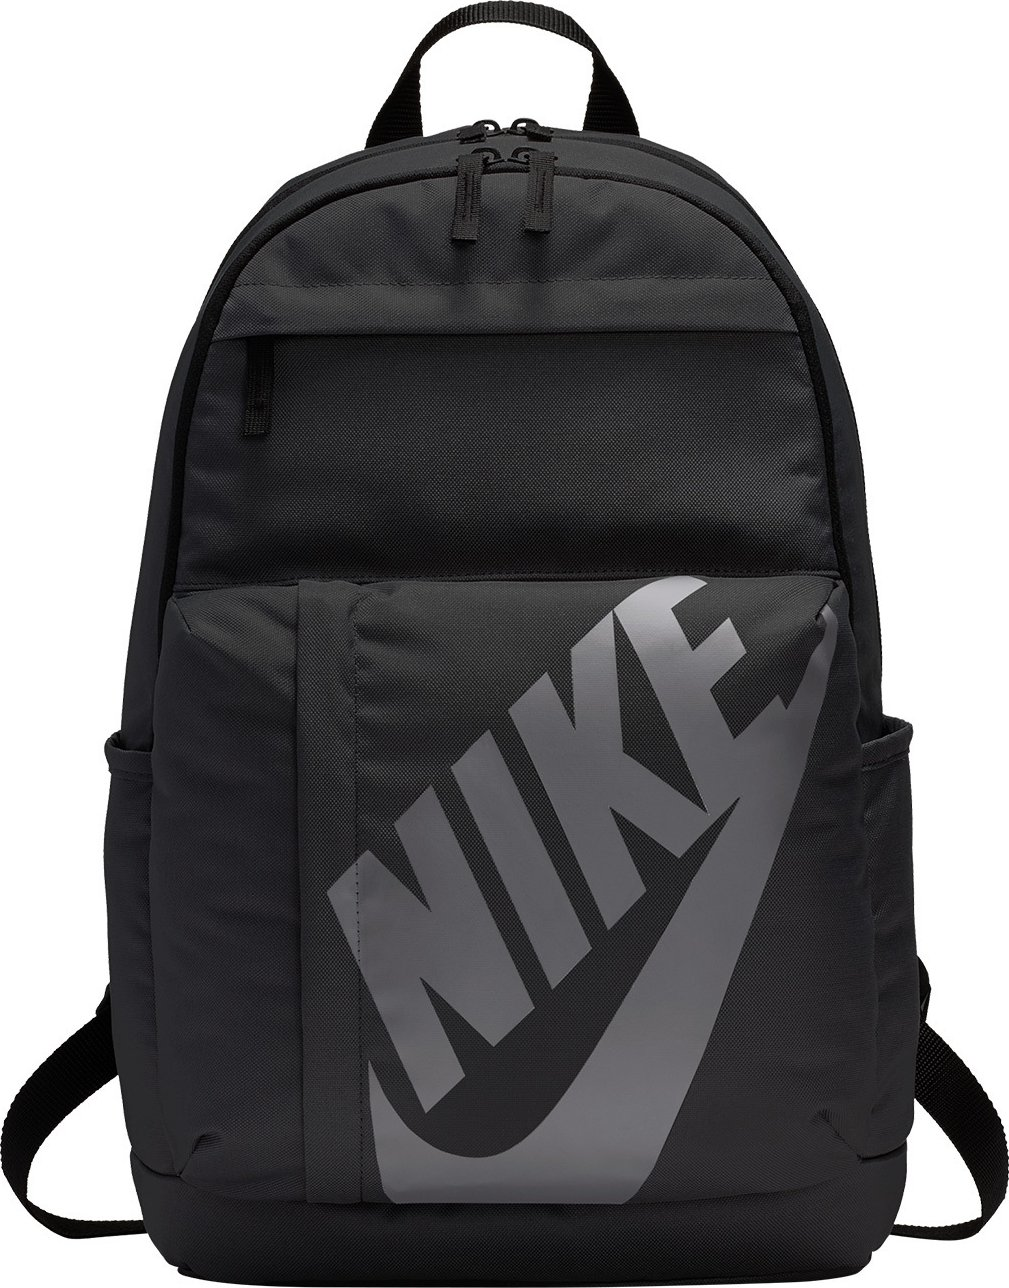 NIKE Sportswear Elemental Backpack BlackAnthracite